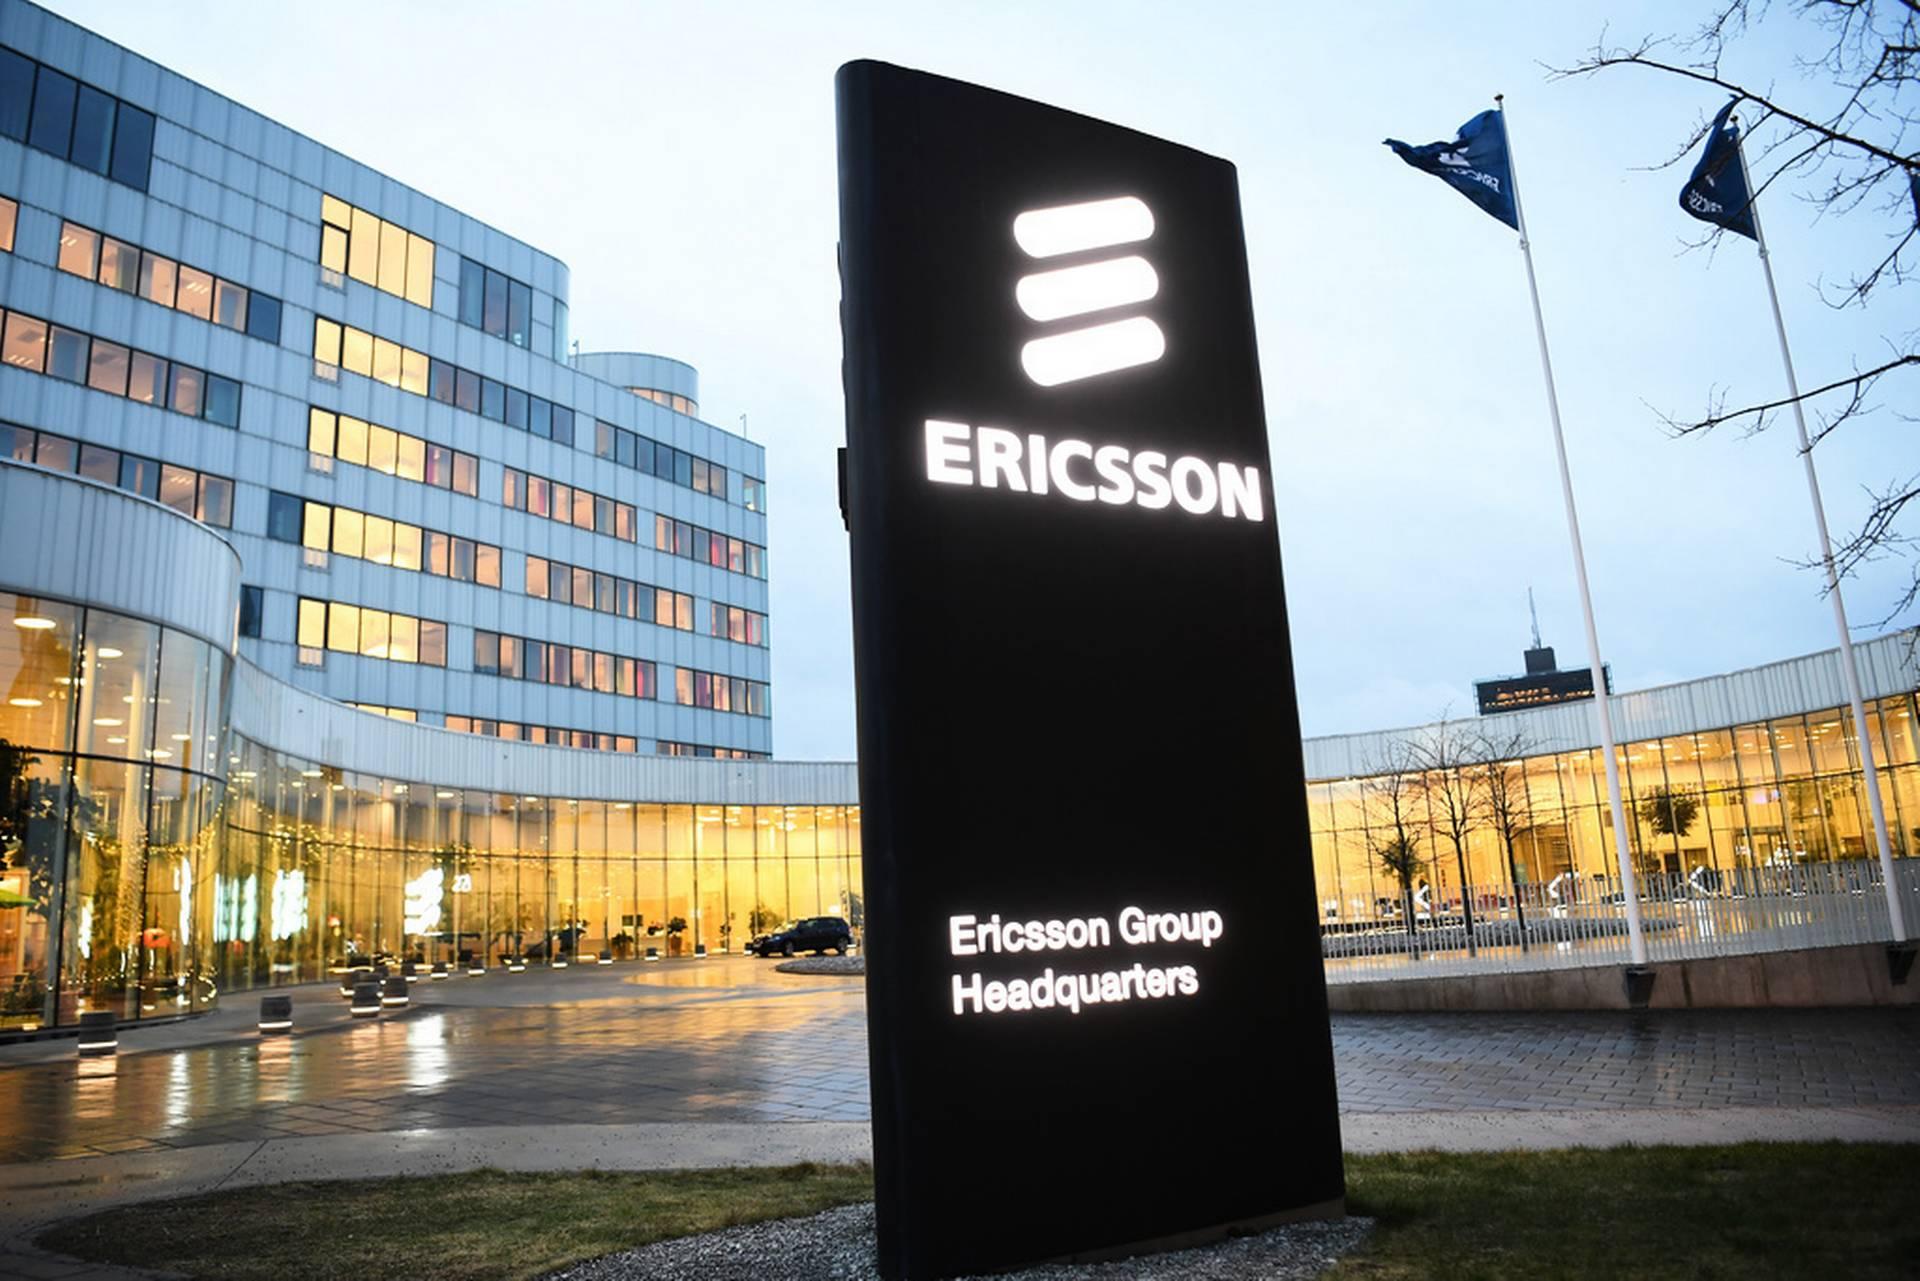 Ericsson will build Verizon's 5G network